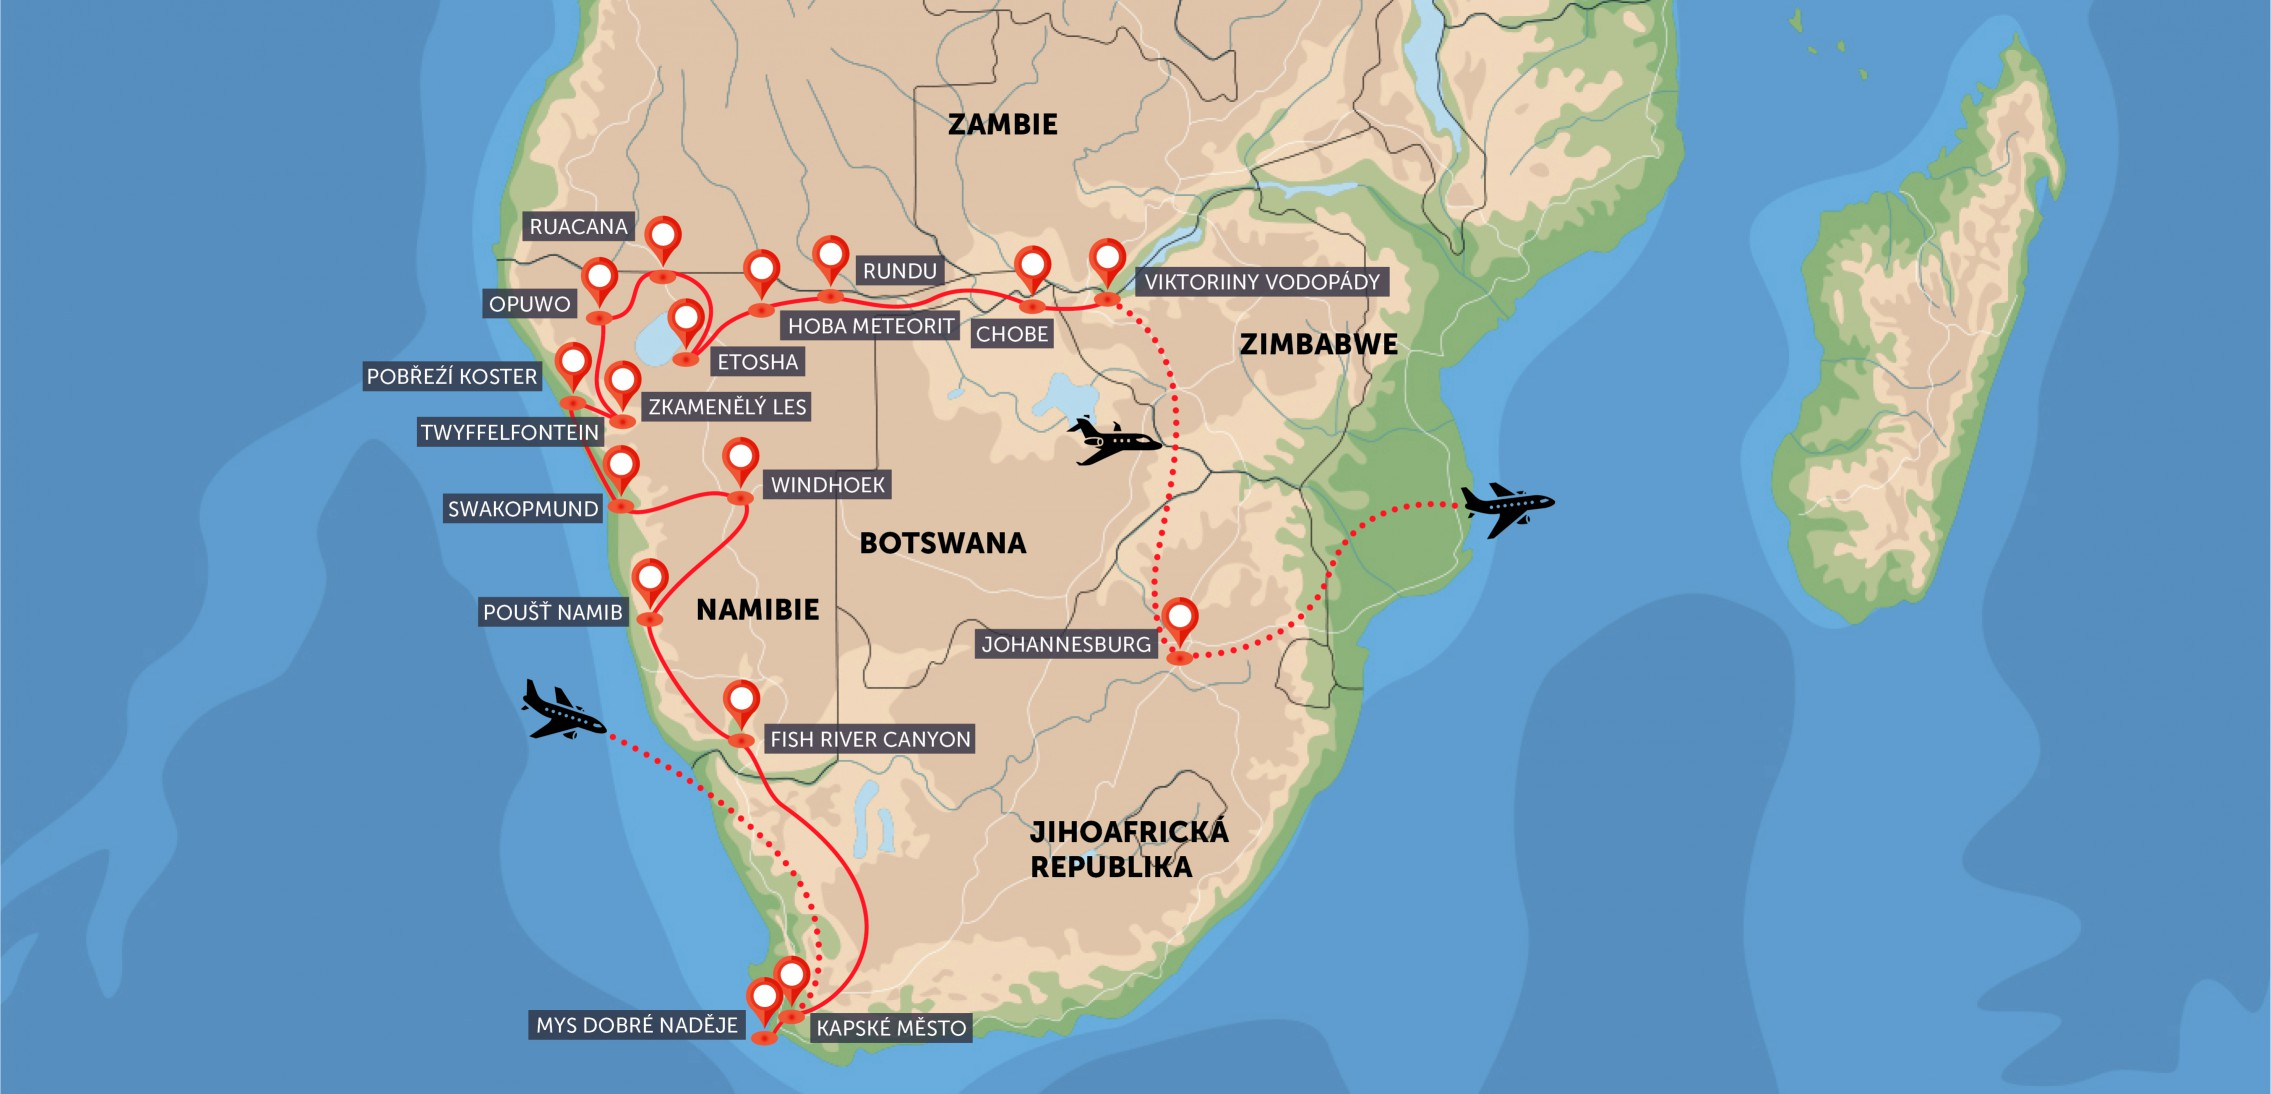 JAR, Namibie, Botswana, Zimbabwe, Zambie